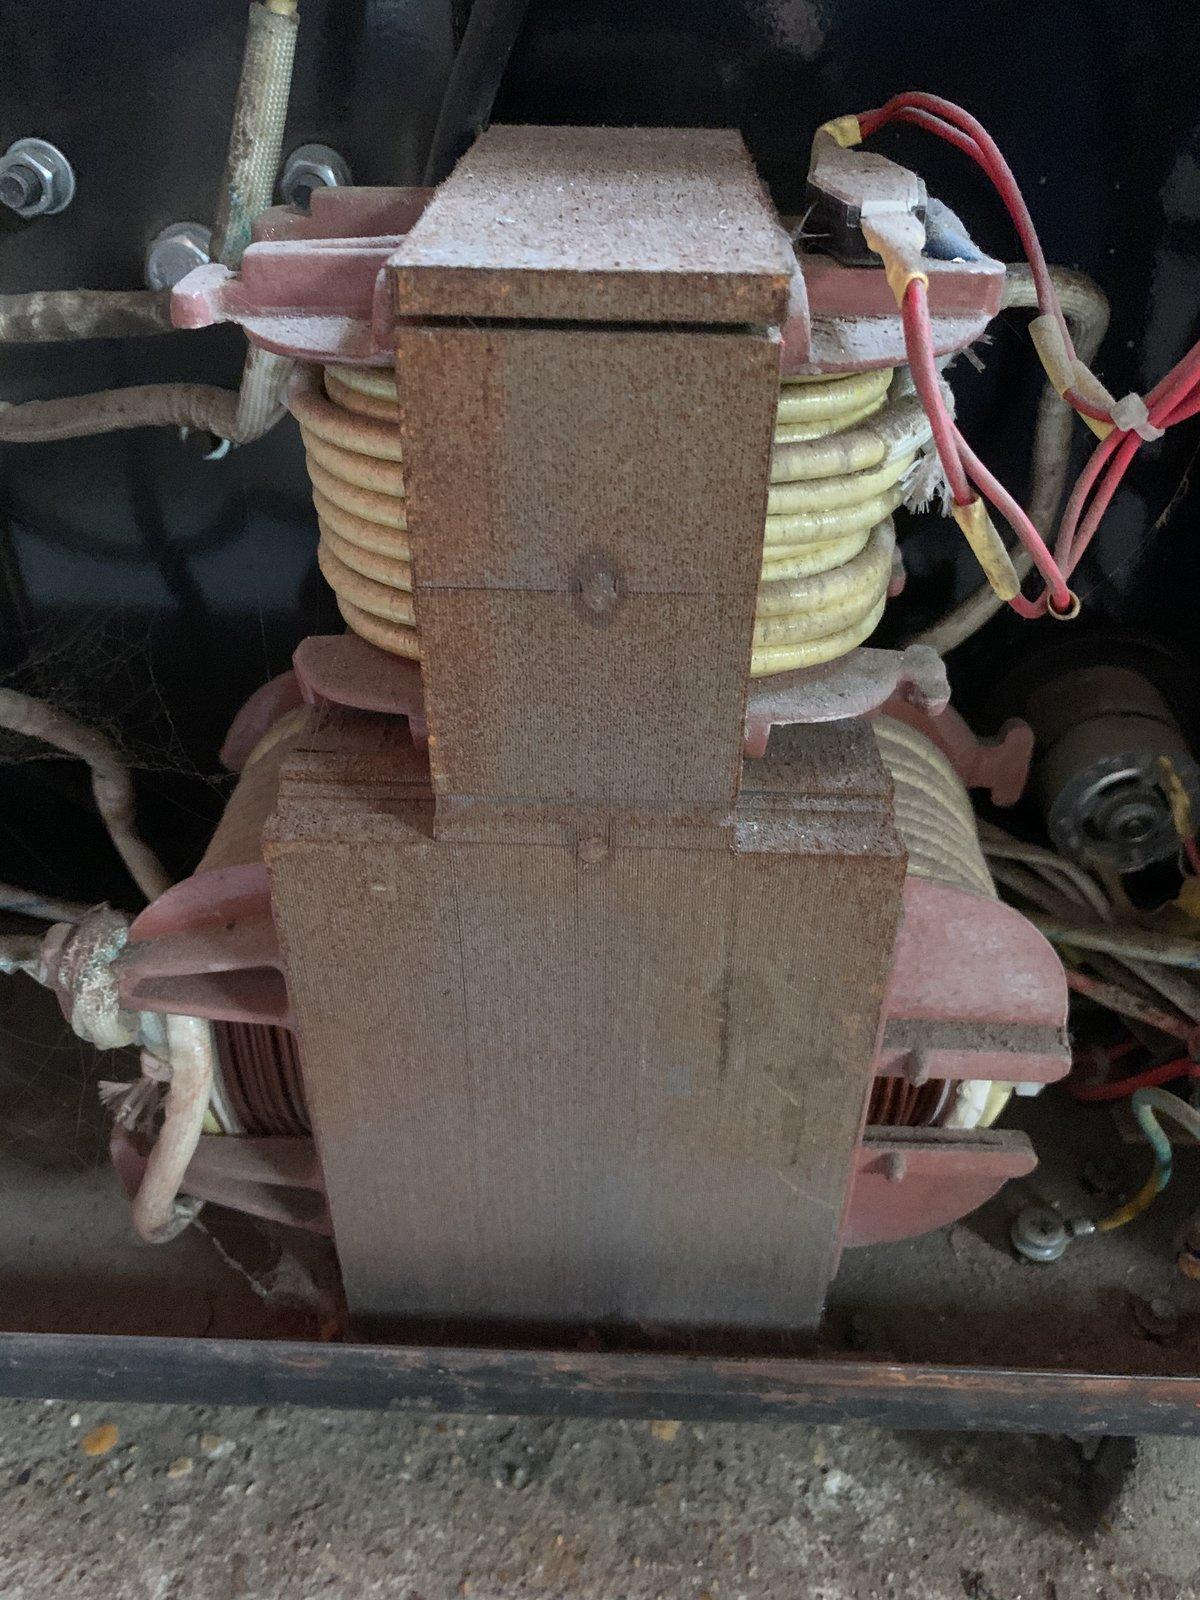 2FC6E664-47AC-4F12-B101-695B65E3ECE2.jpeg